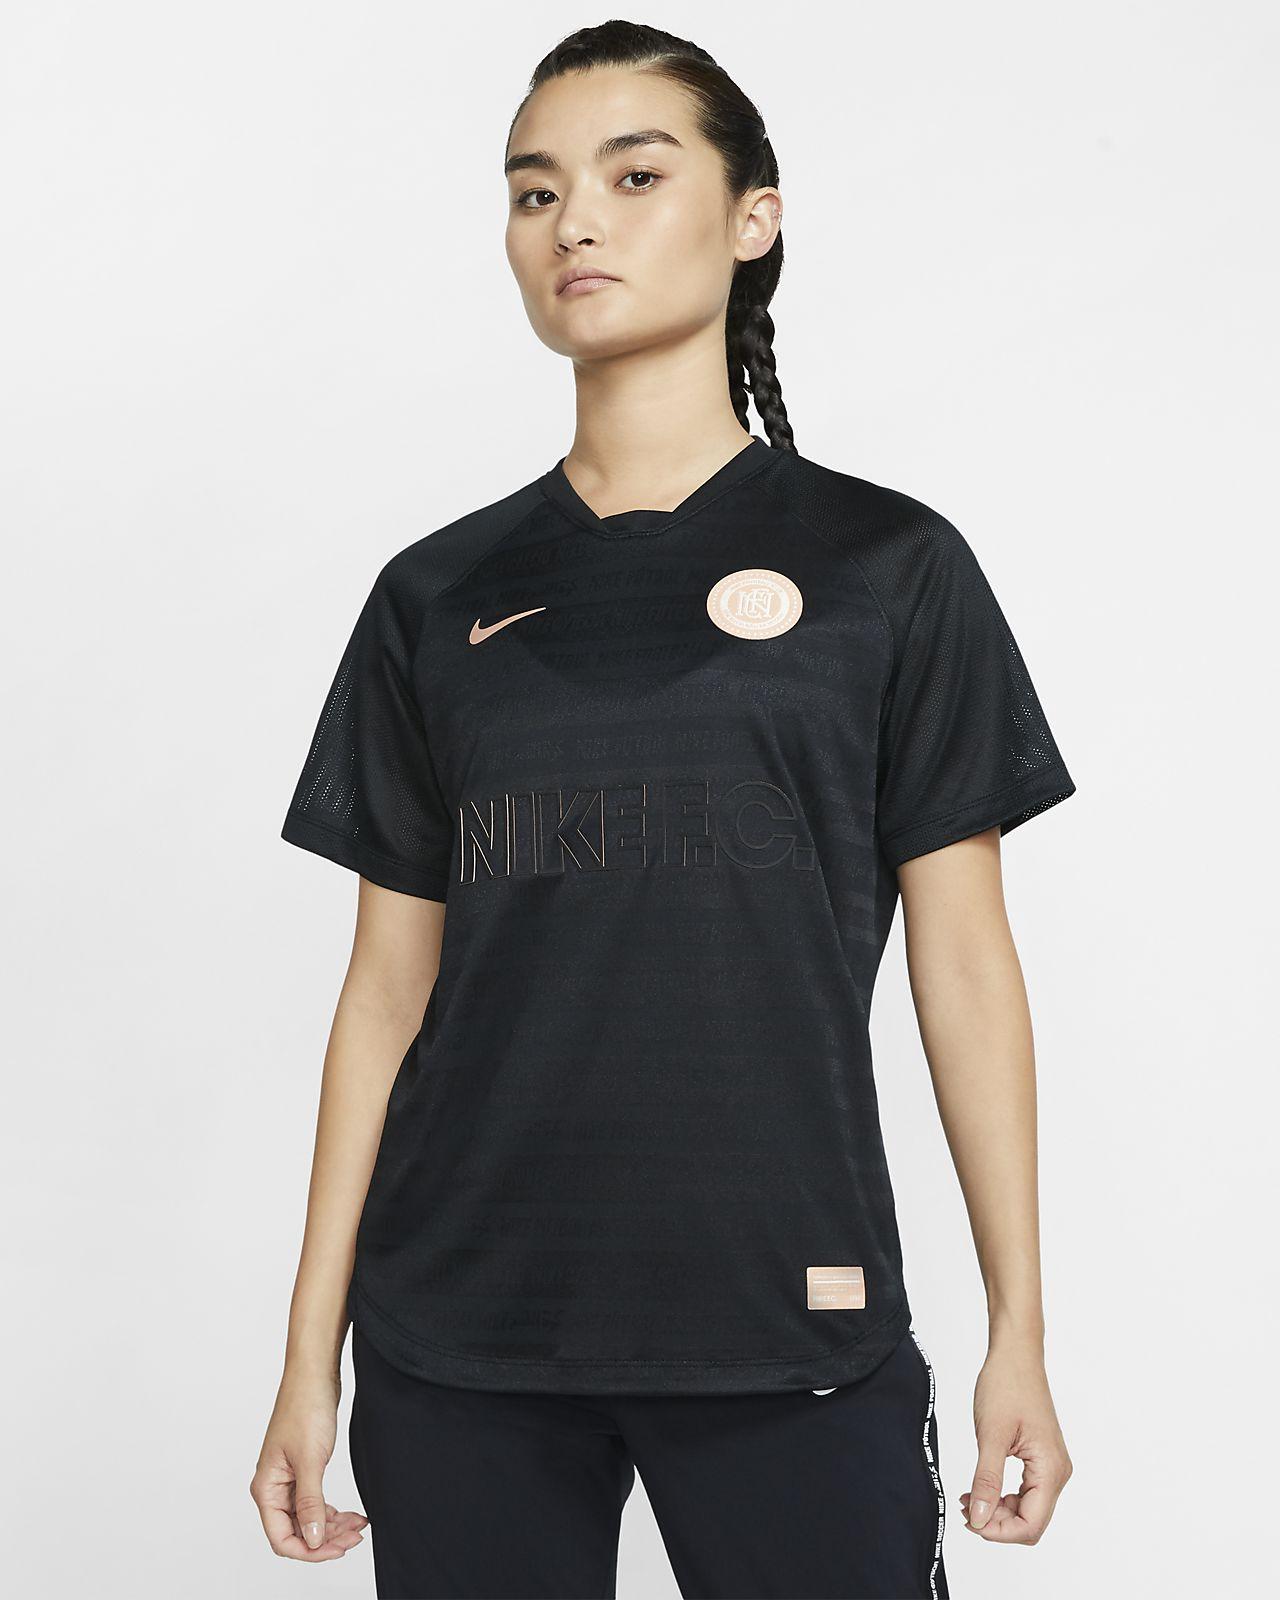 Nike F.C. Dri FIT Women's 12 Zip Soccer Hoodie